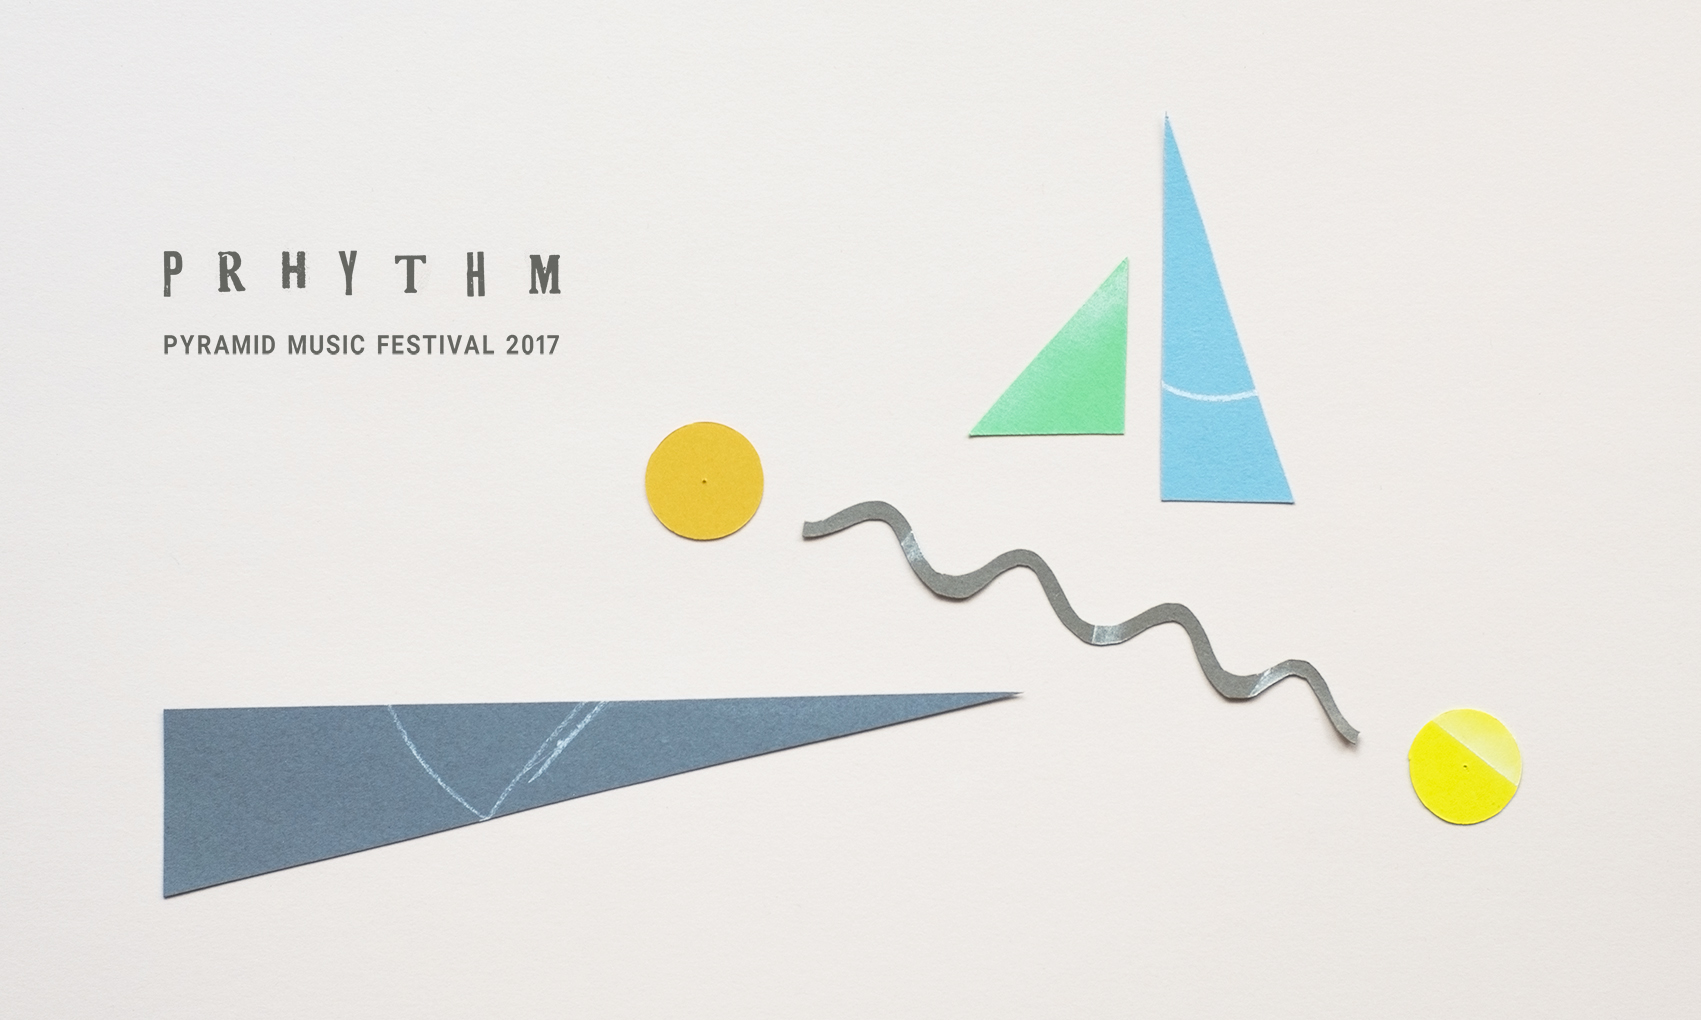 PRHYTHM PYRAMID MUSIC FESTIVAL2017 at 室生山上芸術の森公園